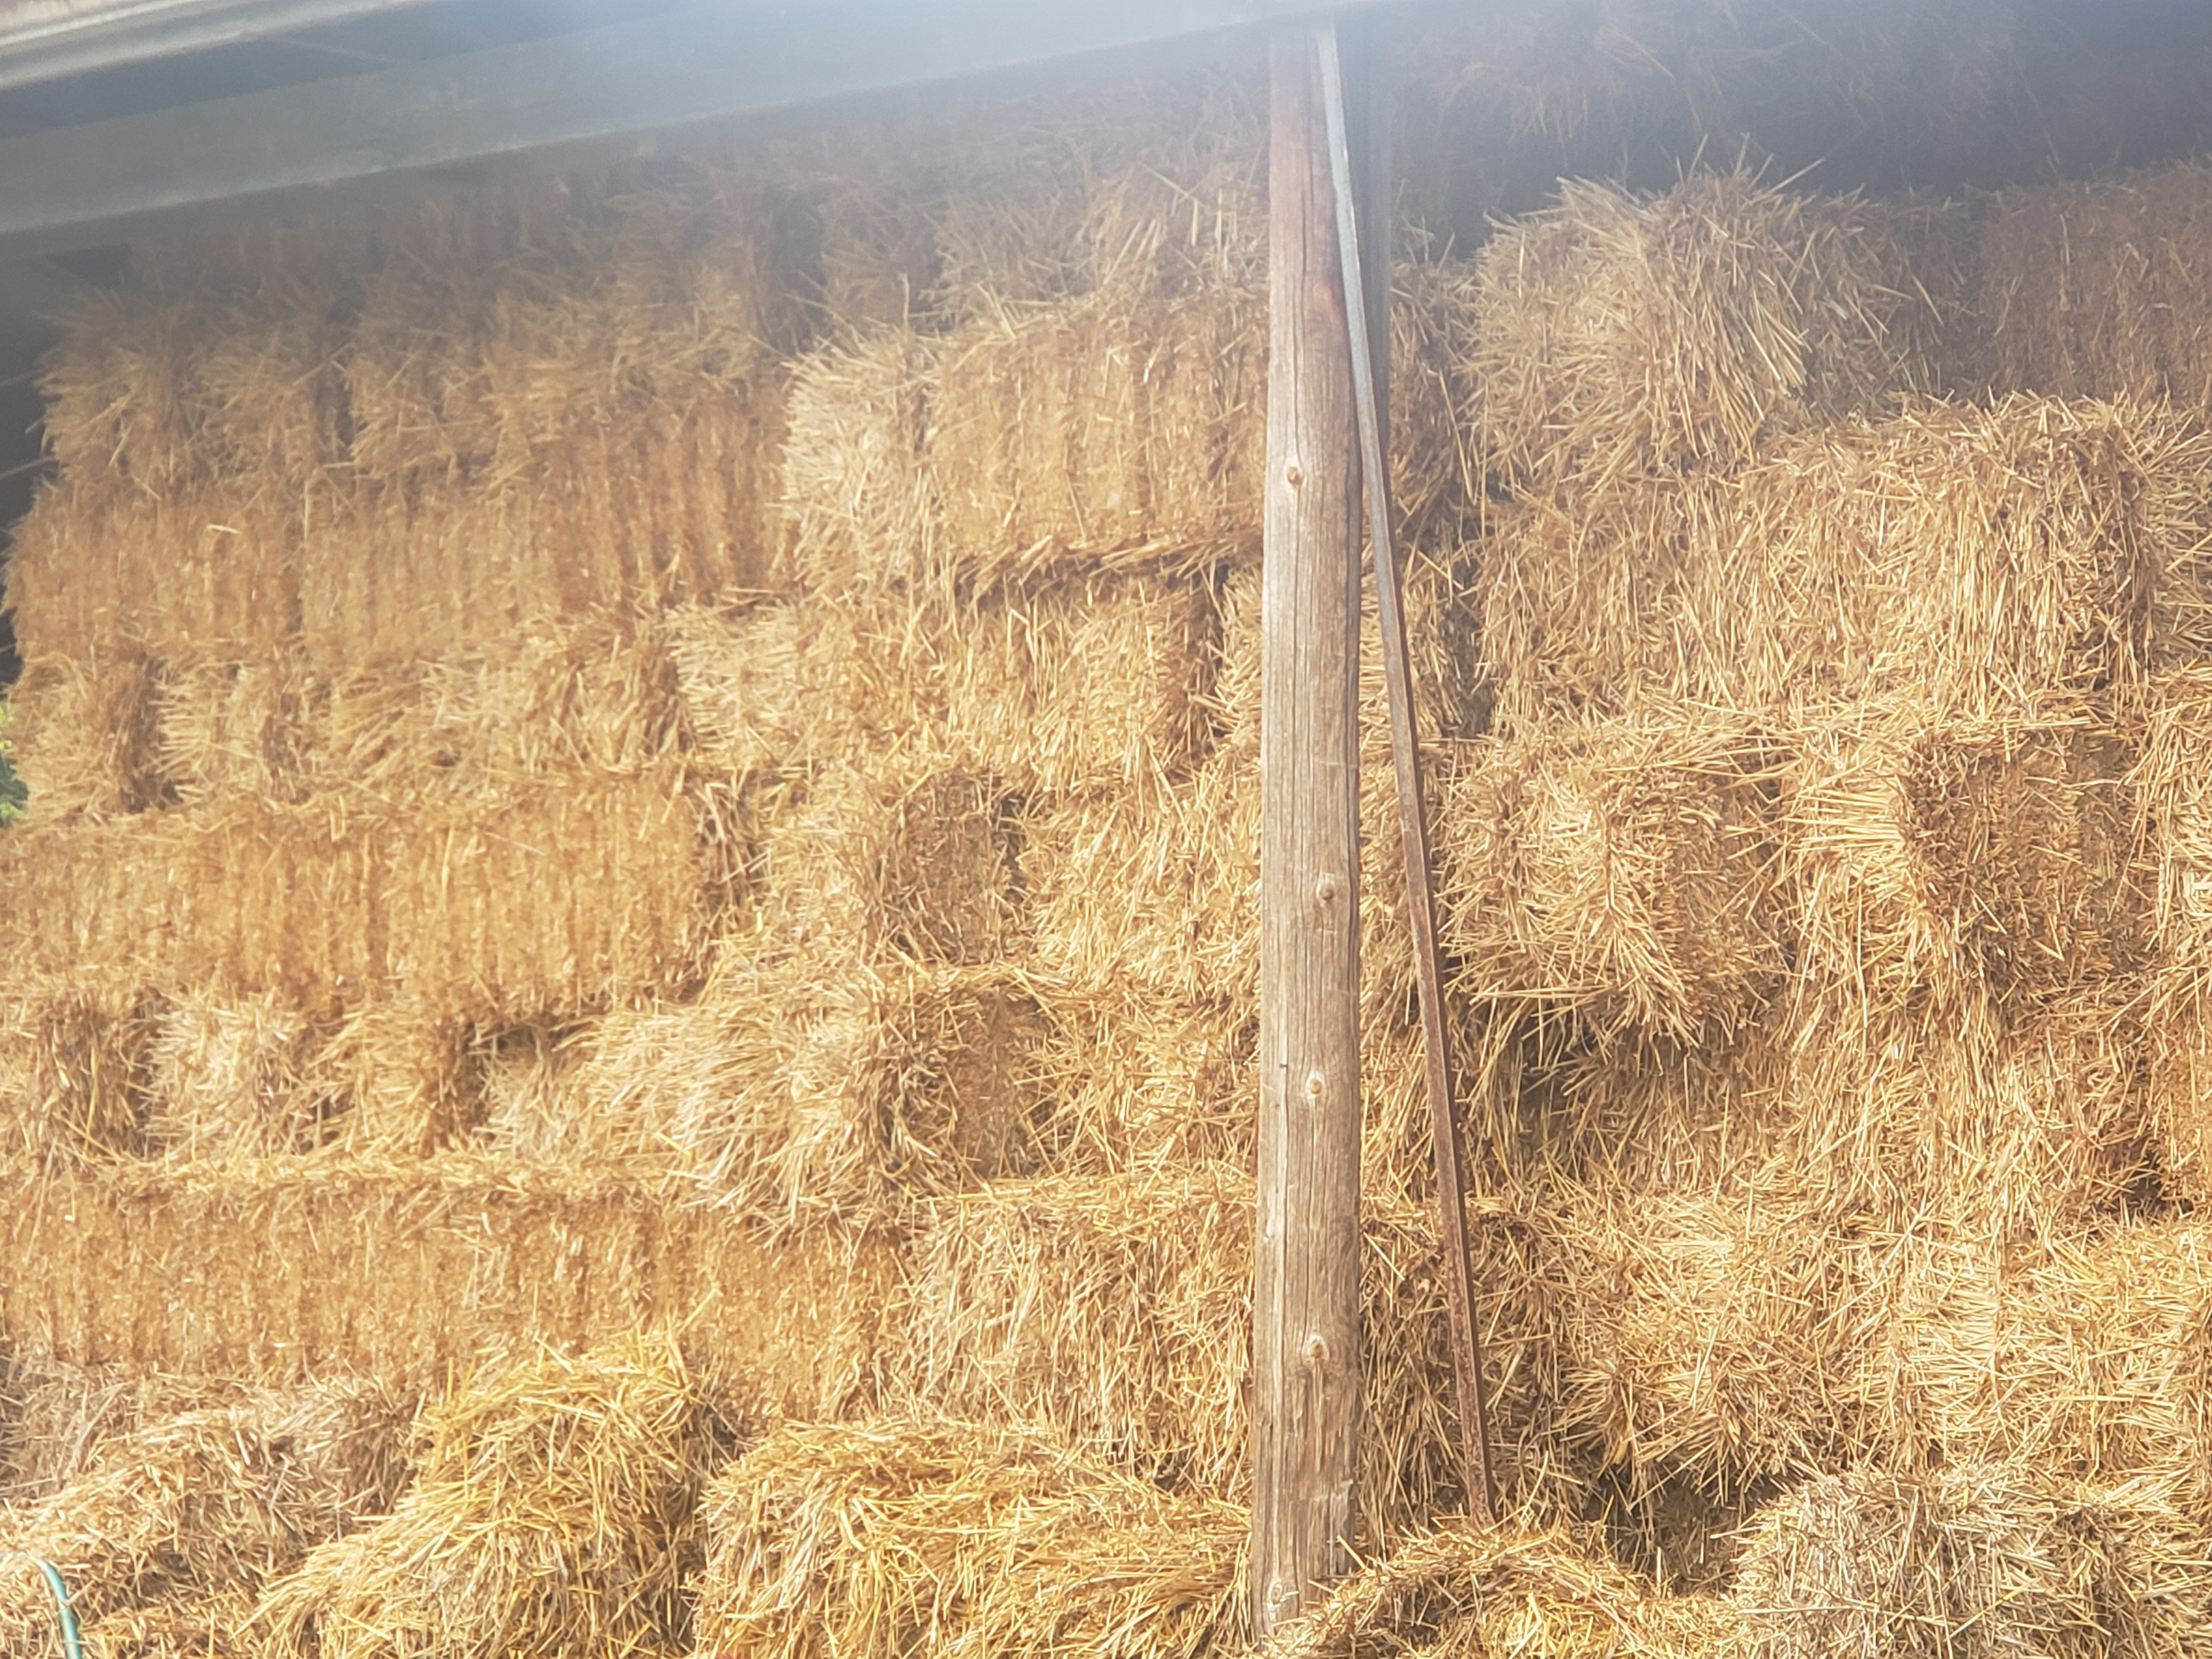 29affb78b45 Hay For sale in waterloo